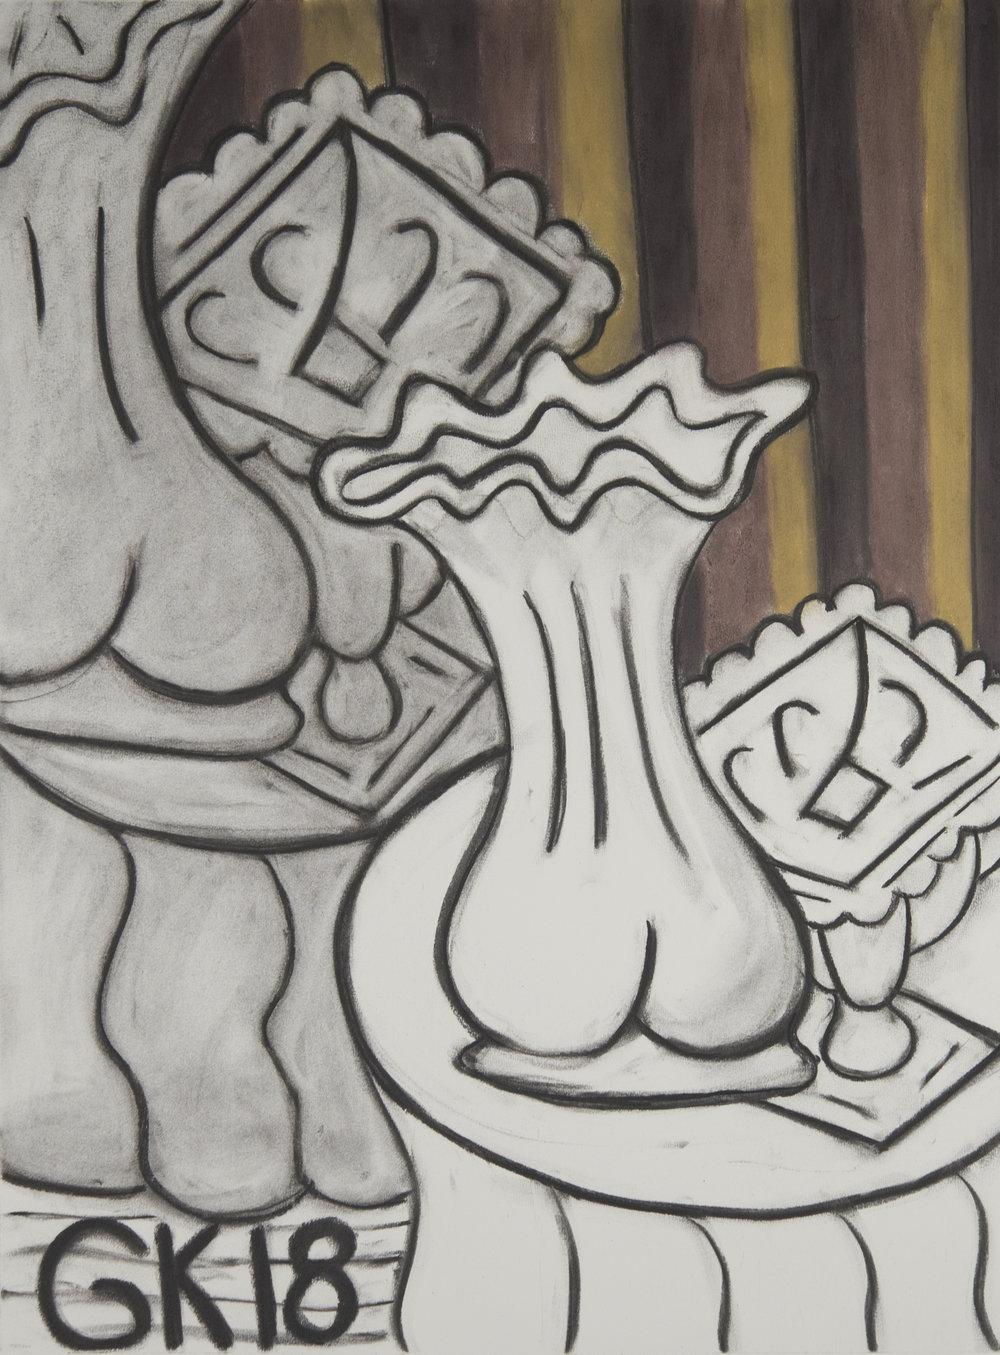 Monochrome Colletive : Gary Kret : Tokarski Series #8 : Derwent colored charcoal on Reeves BFK : 30 x 22 in. : $2,400.jpg